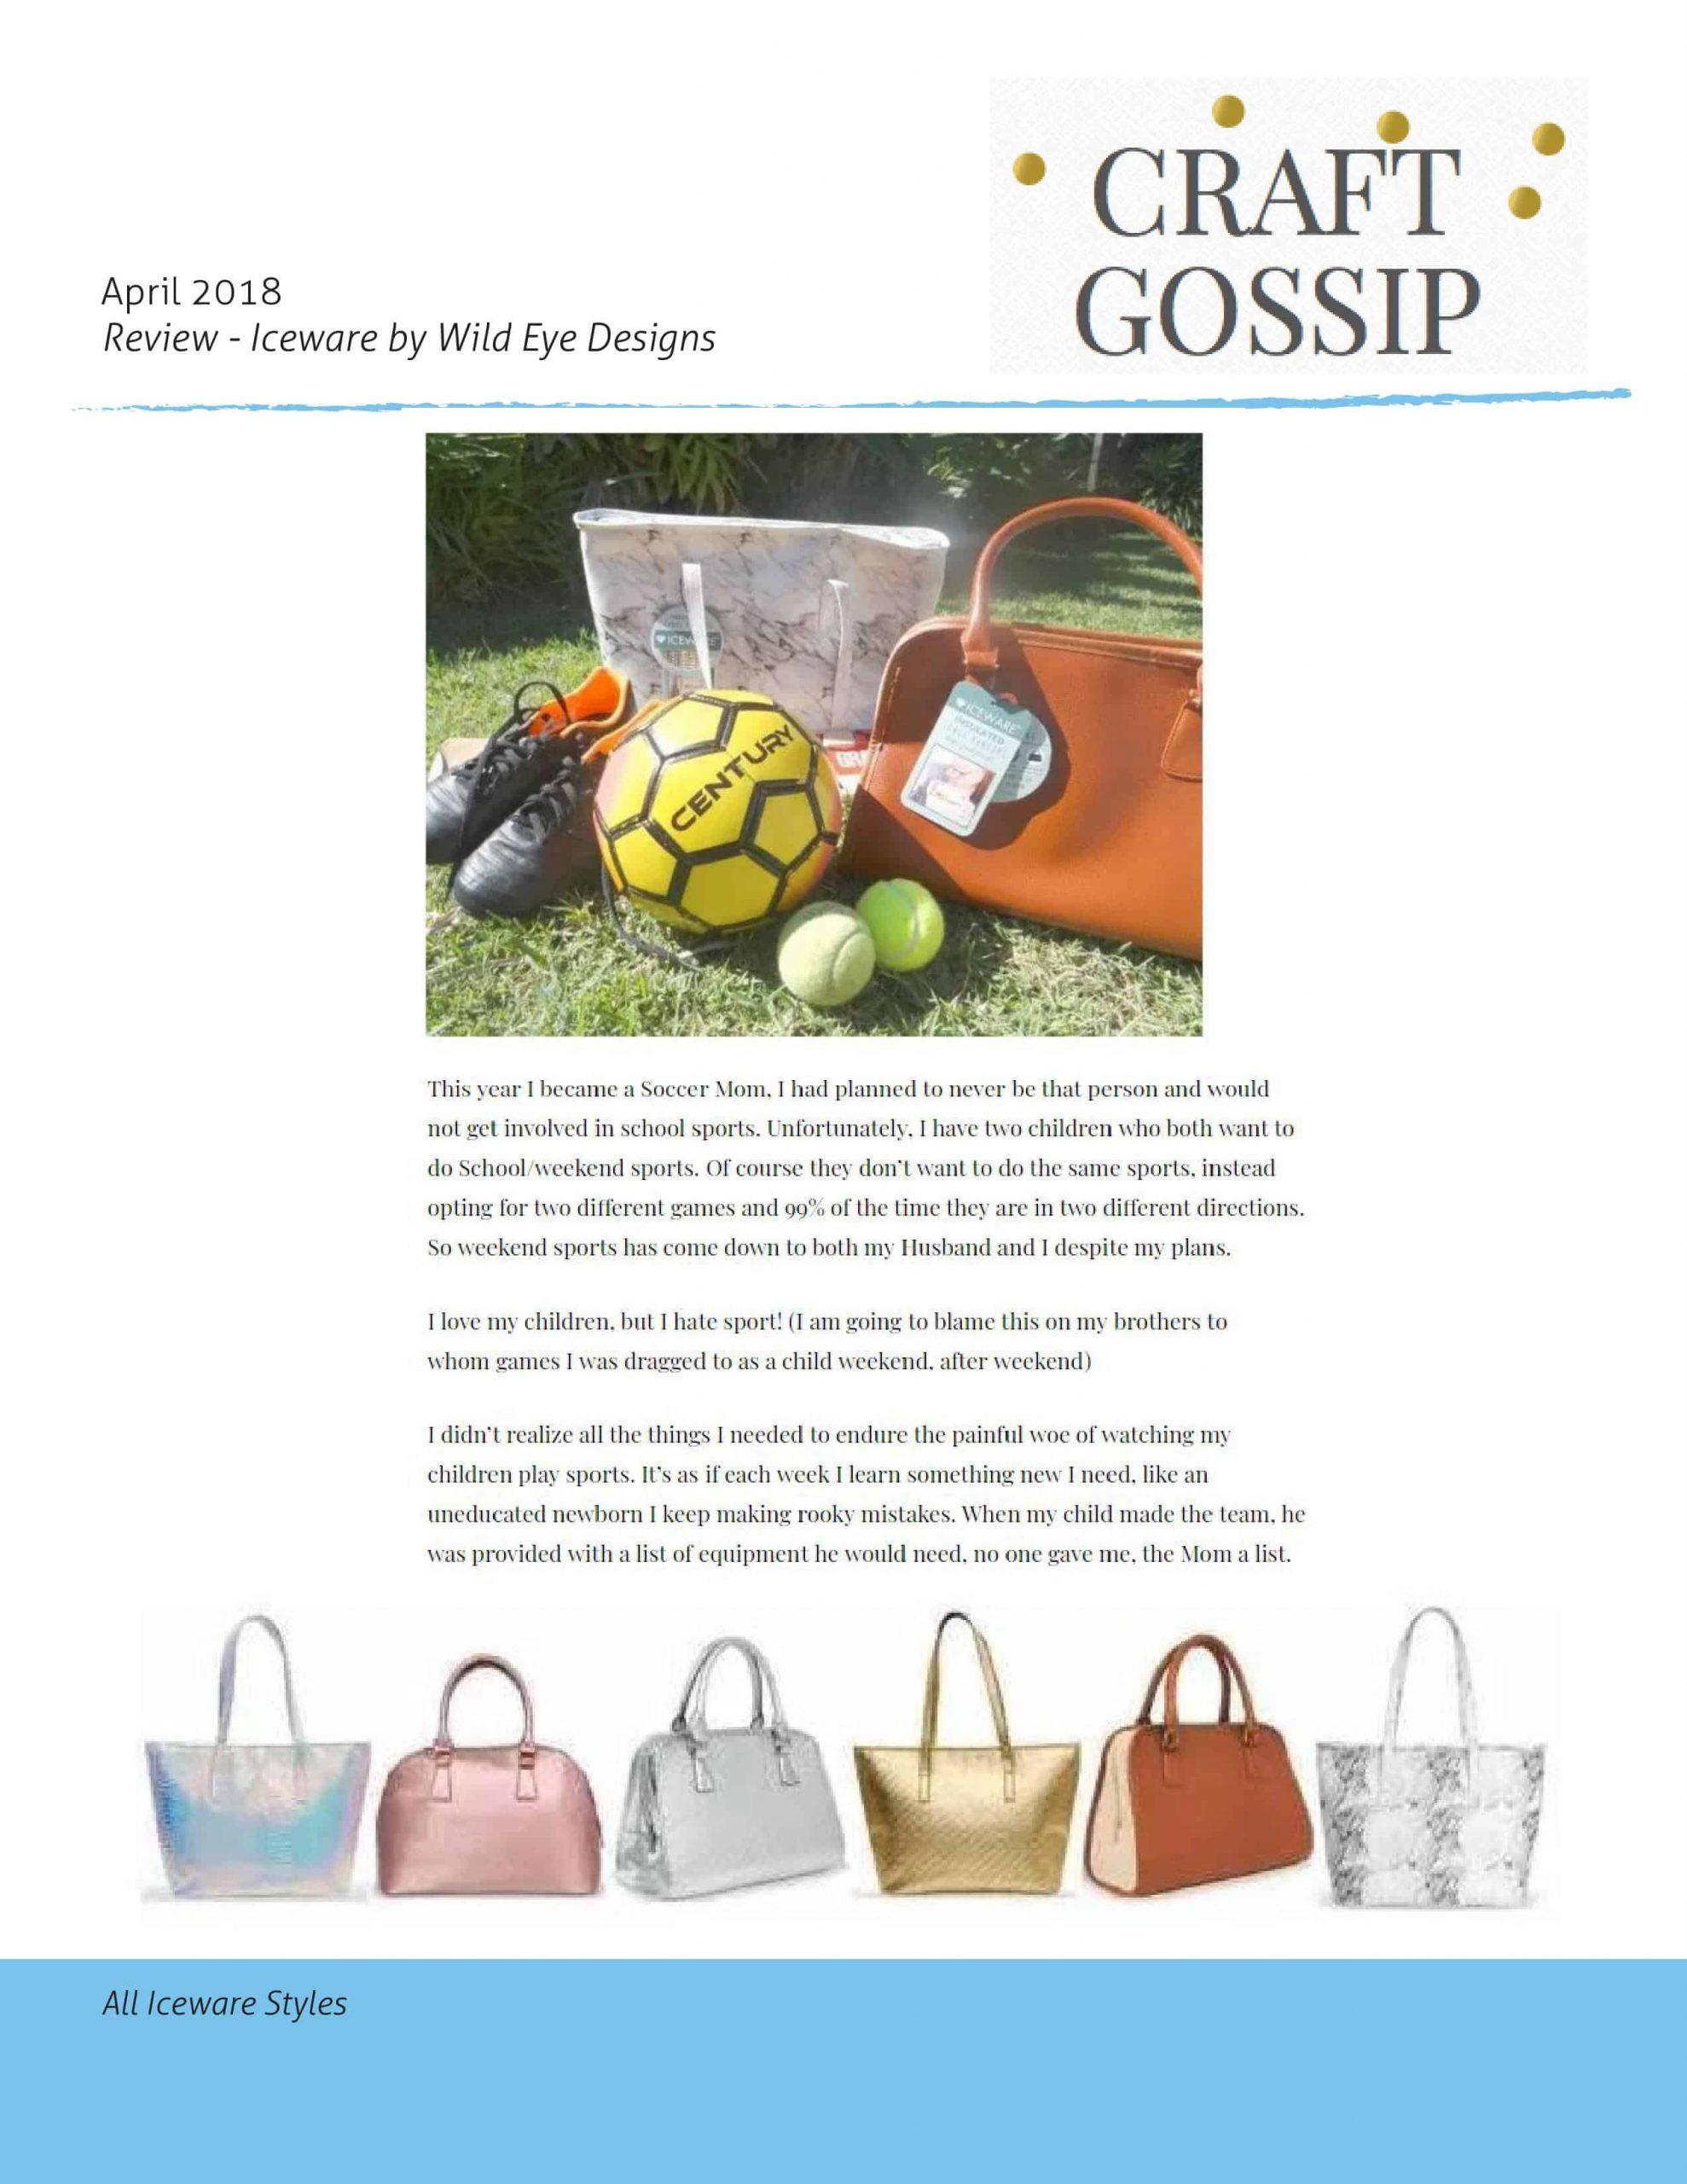 Craft Gossip April 2018 Review